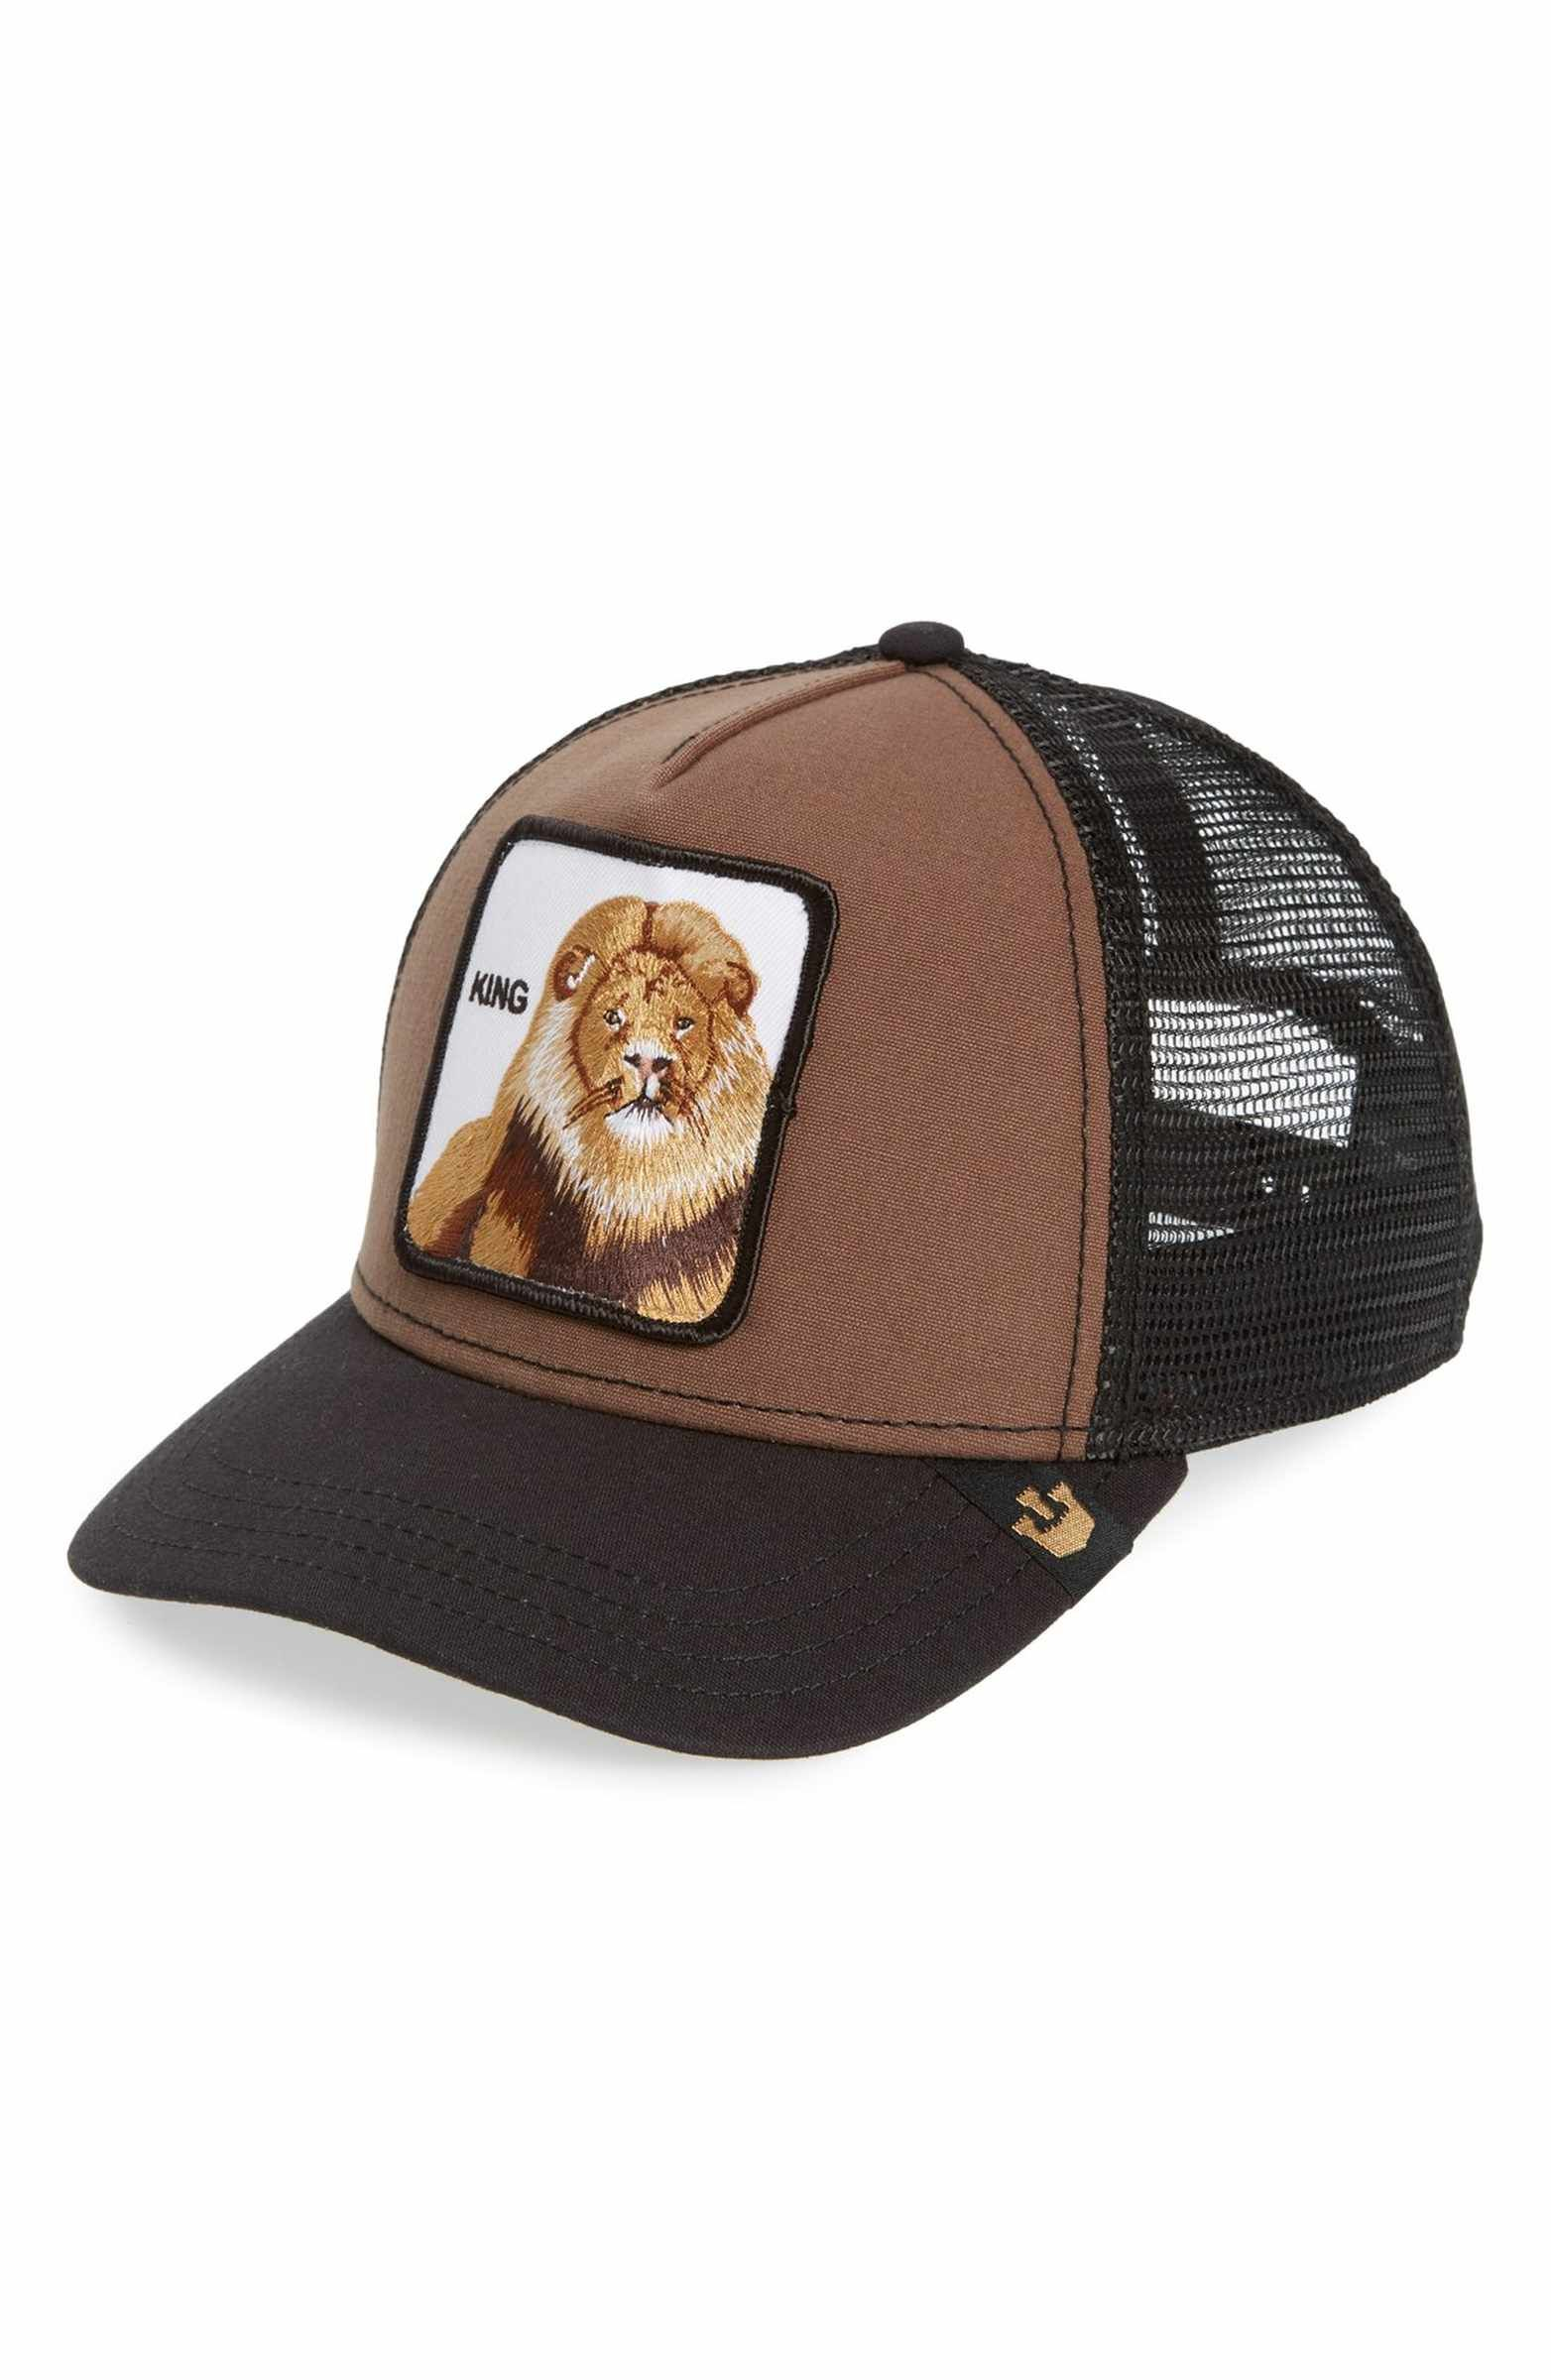 59cd2dd5482163 Main Image - Goorin Brothers 'Animal Farm - King' Trucker Hat ...